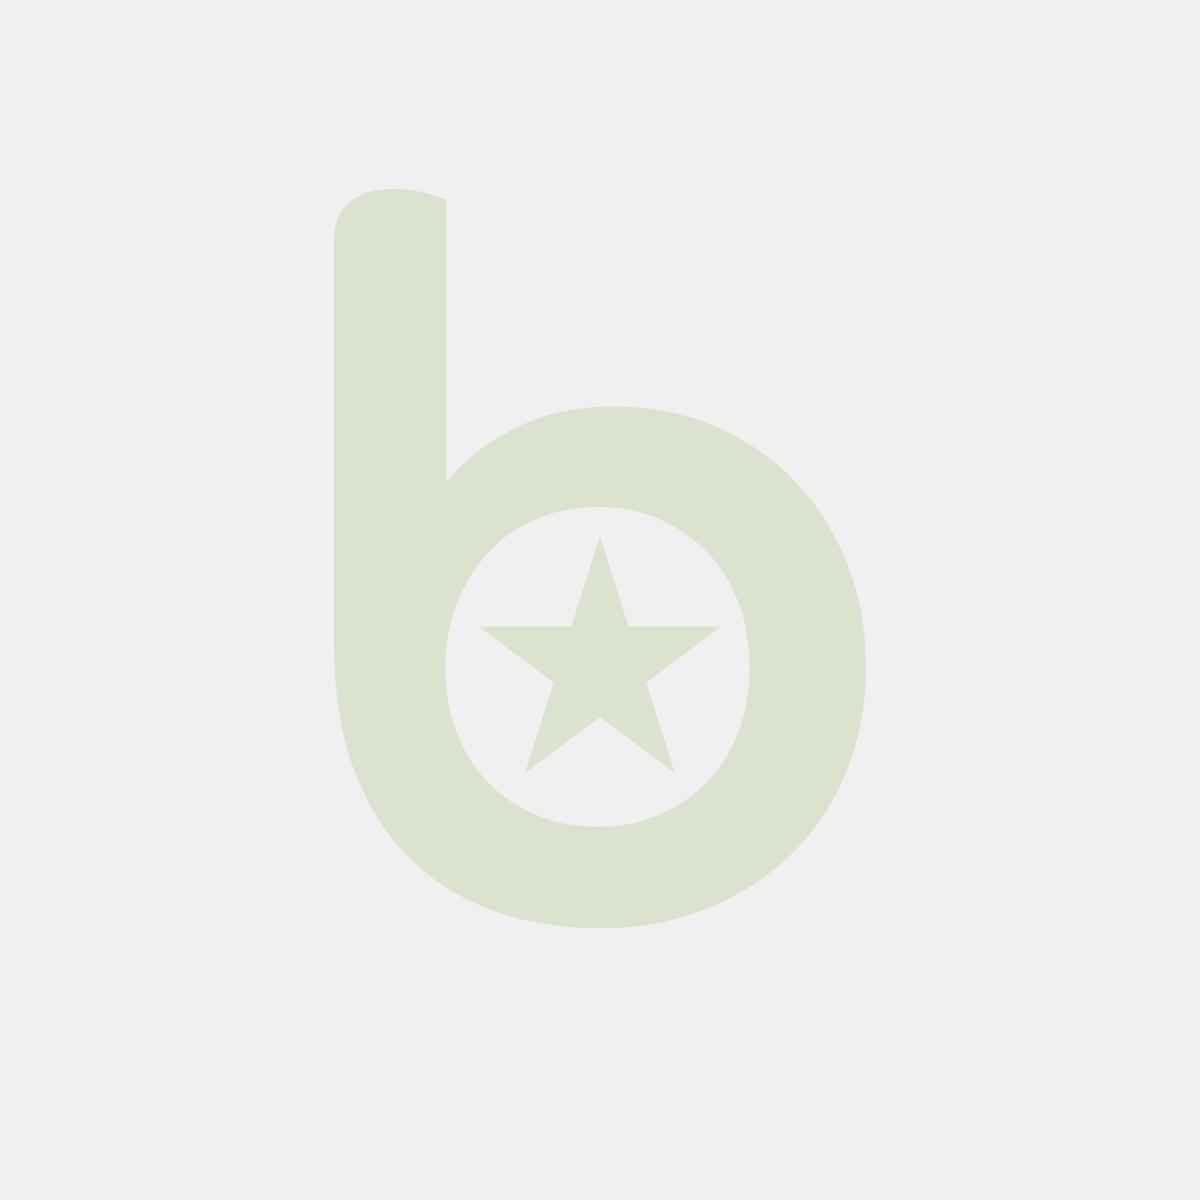 Patyczki 9cm GOLF op. 250szt - FINGERFOOD